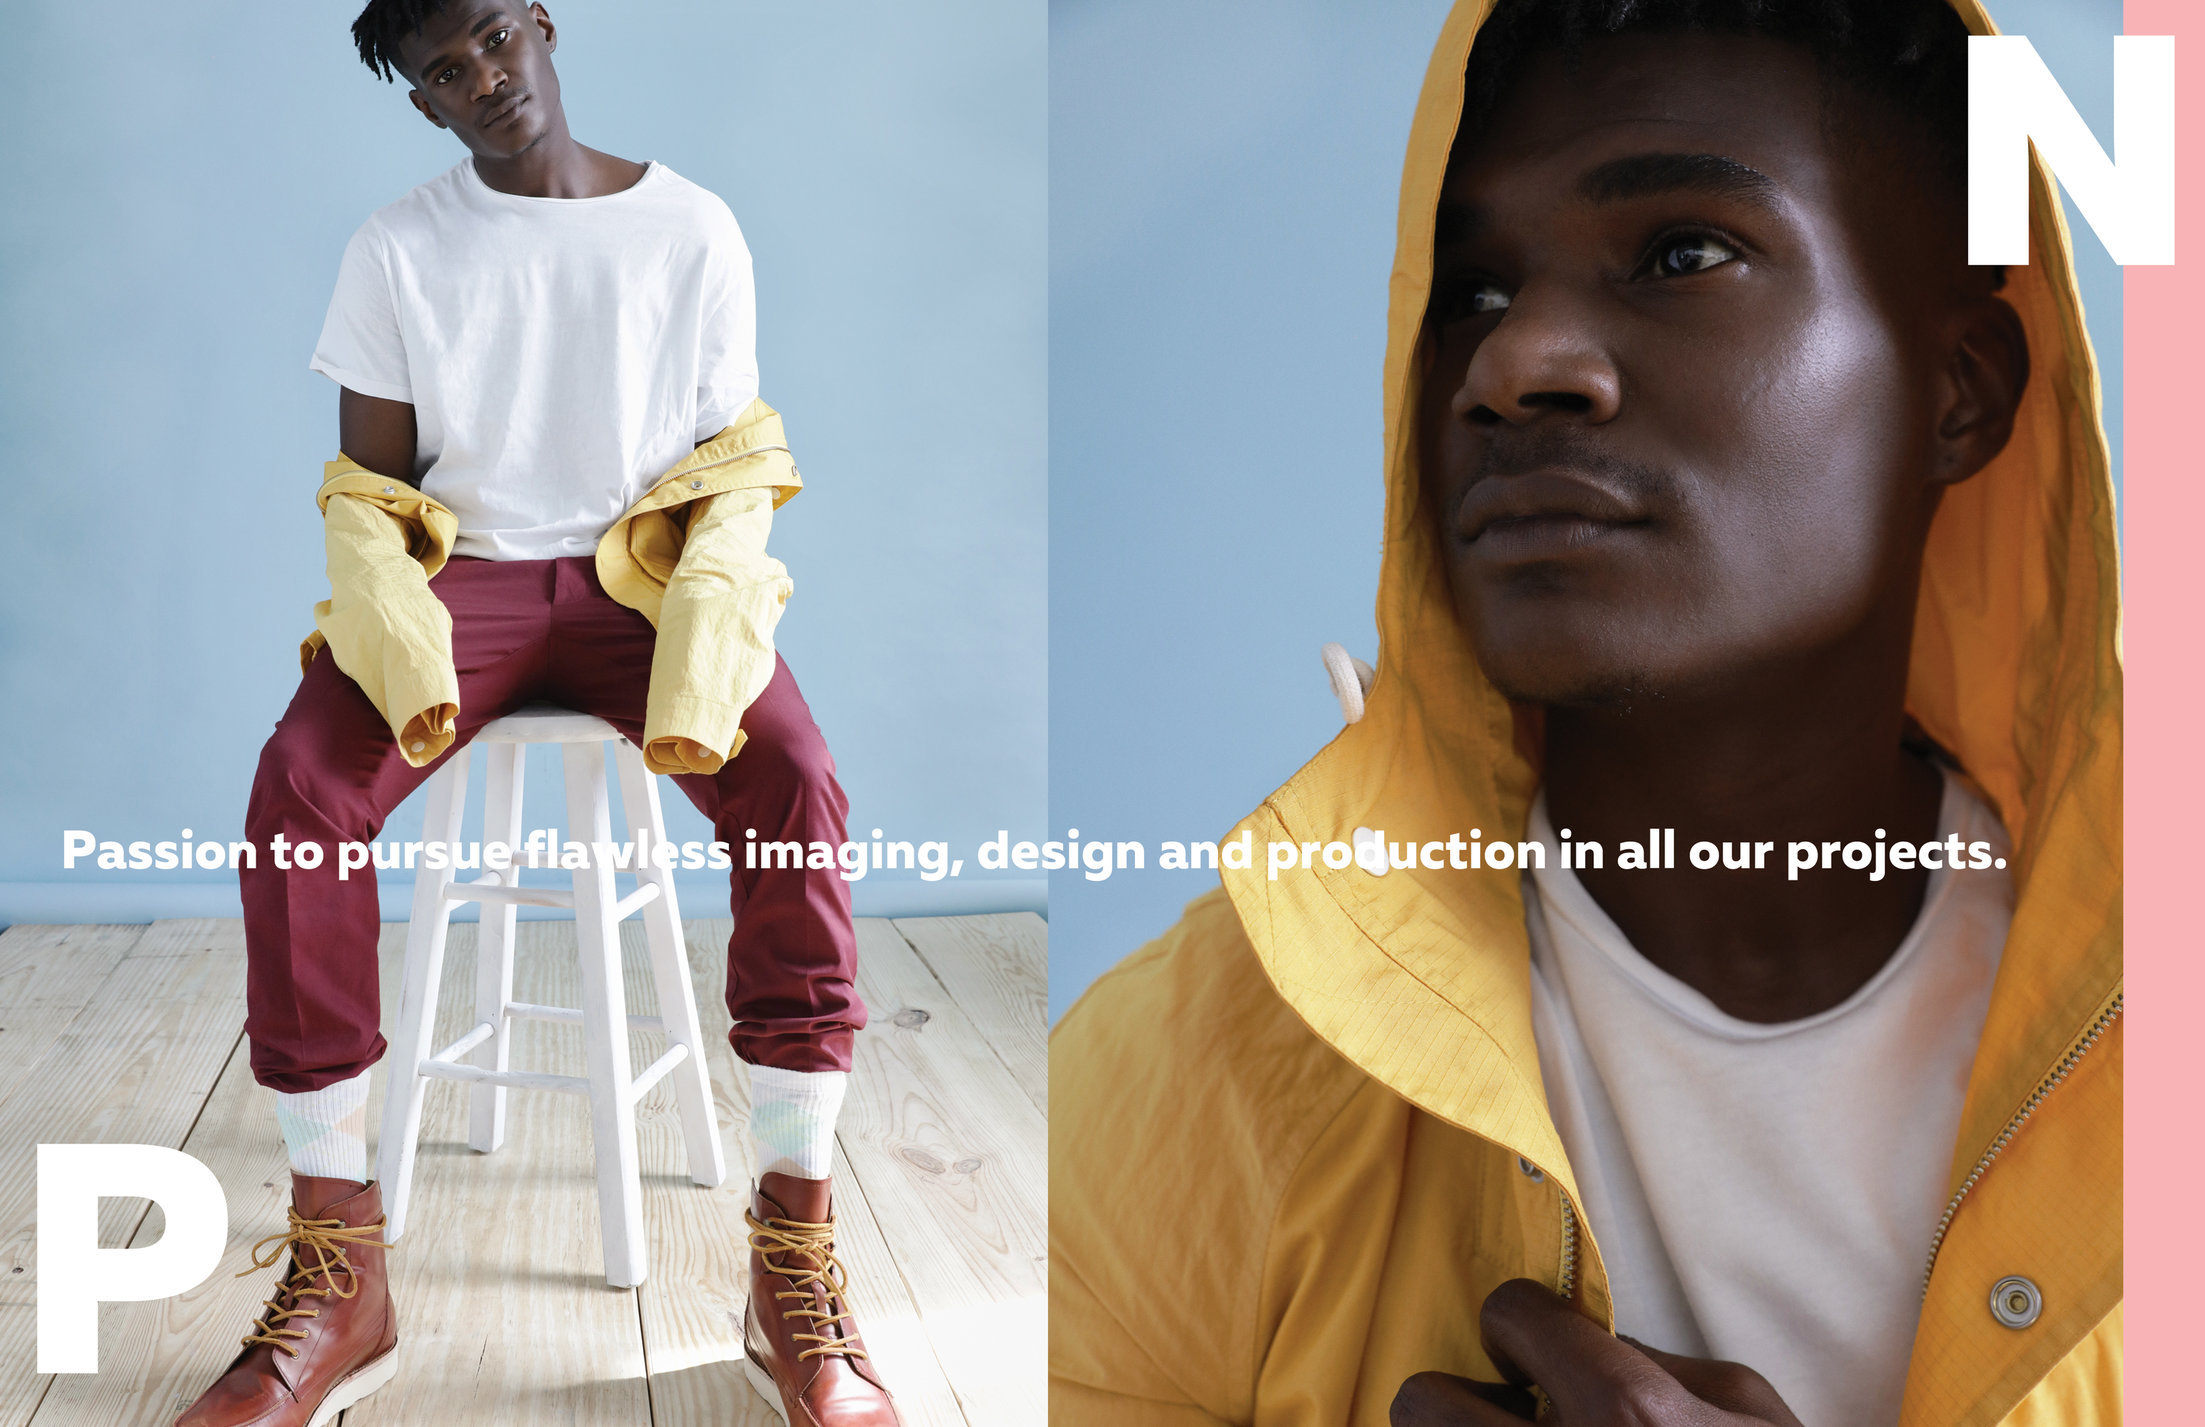 trevor-front-model-fashion-photographer-nico-stipcianos-miami-copy-99.jpg